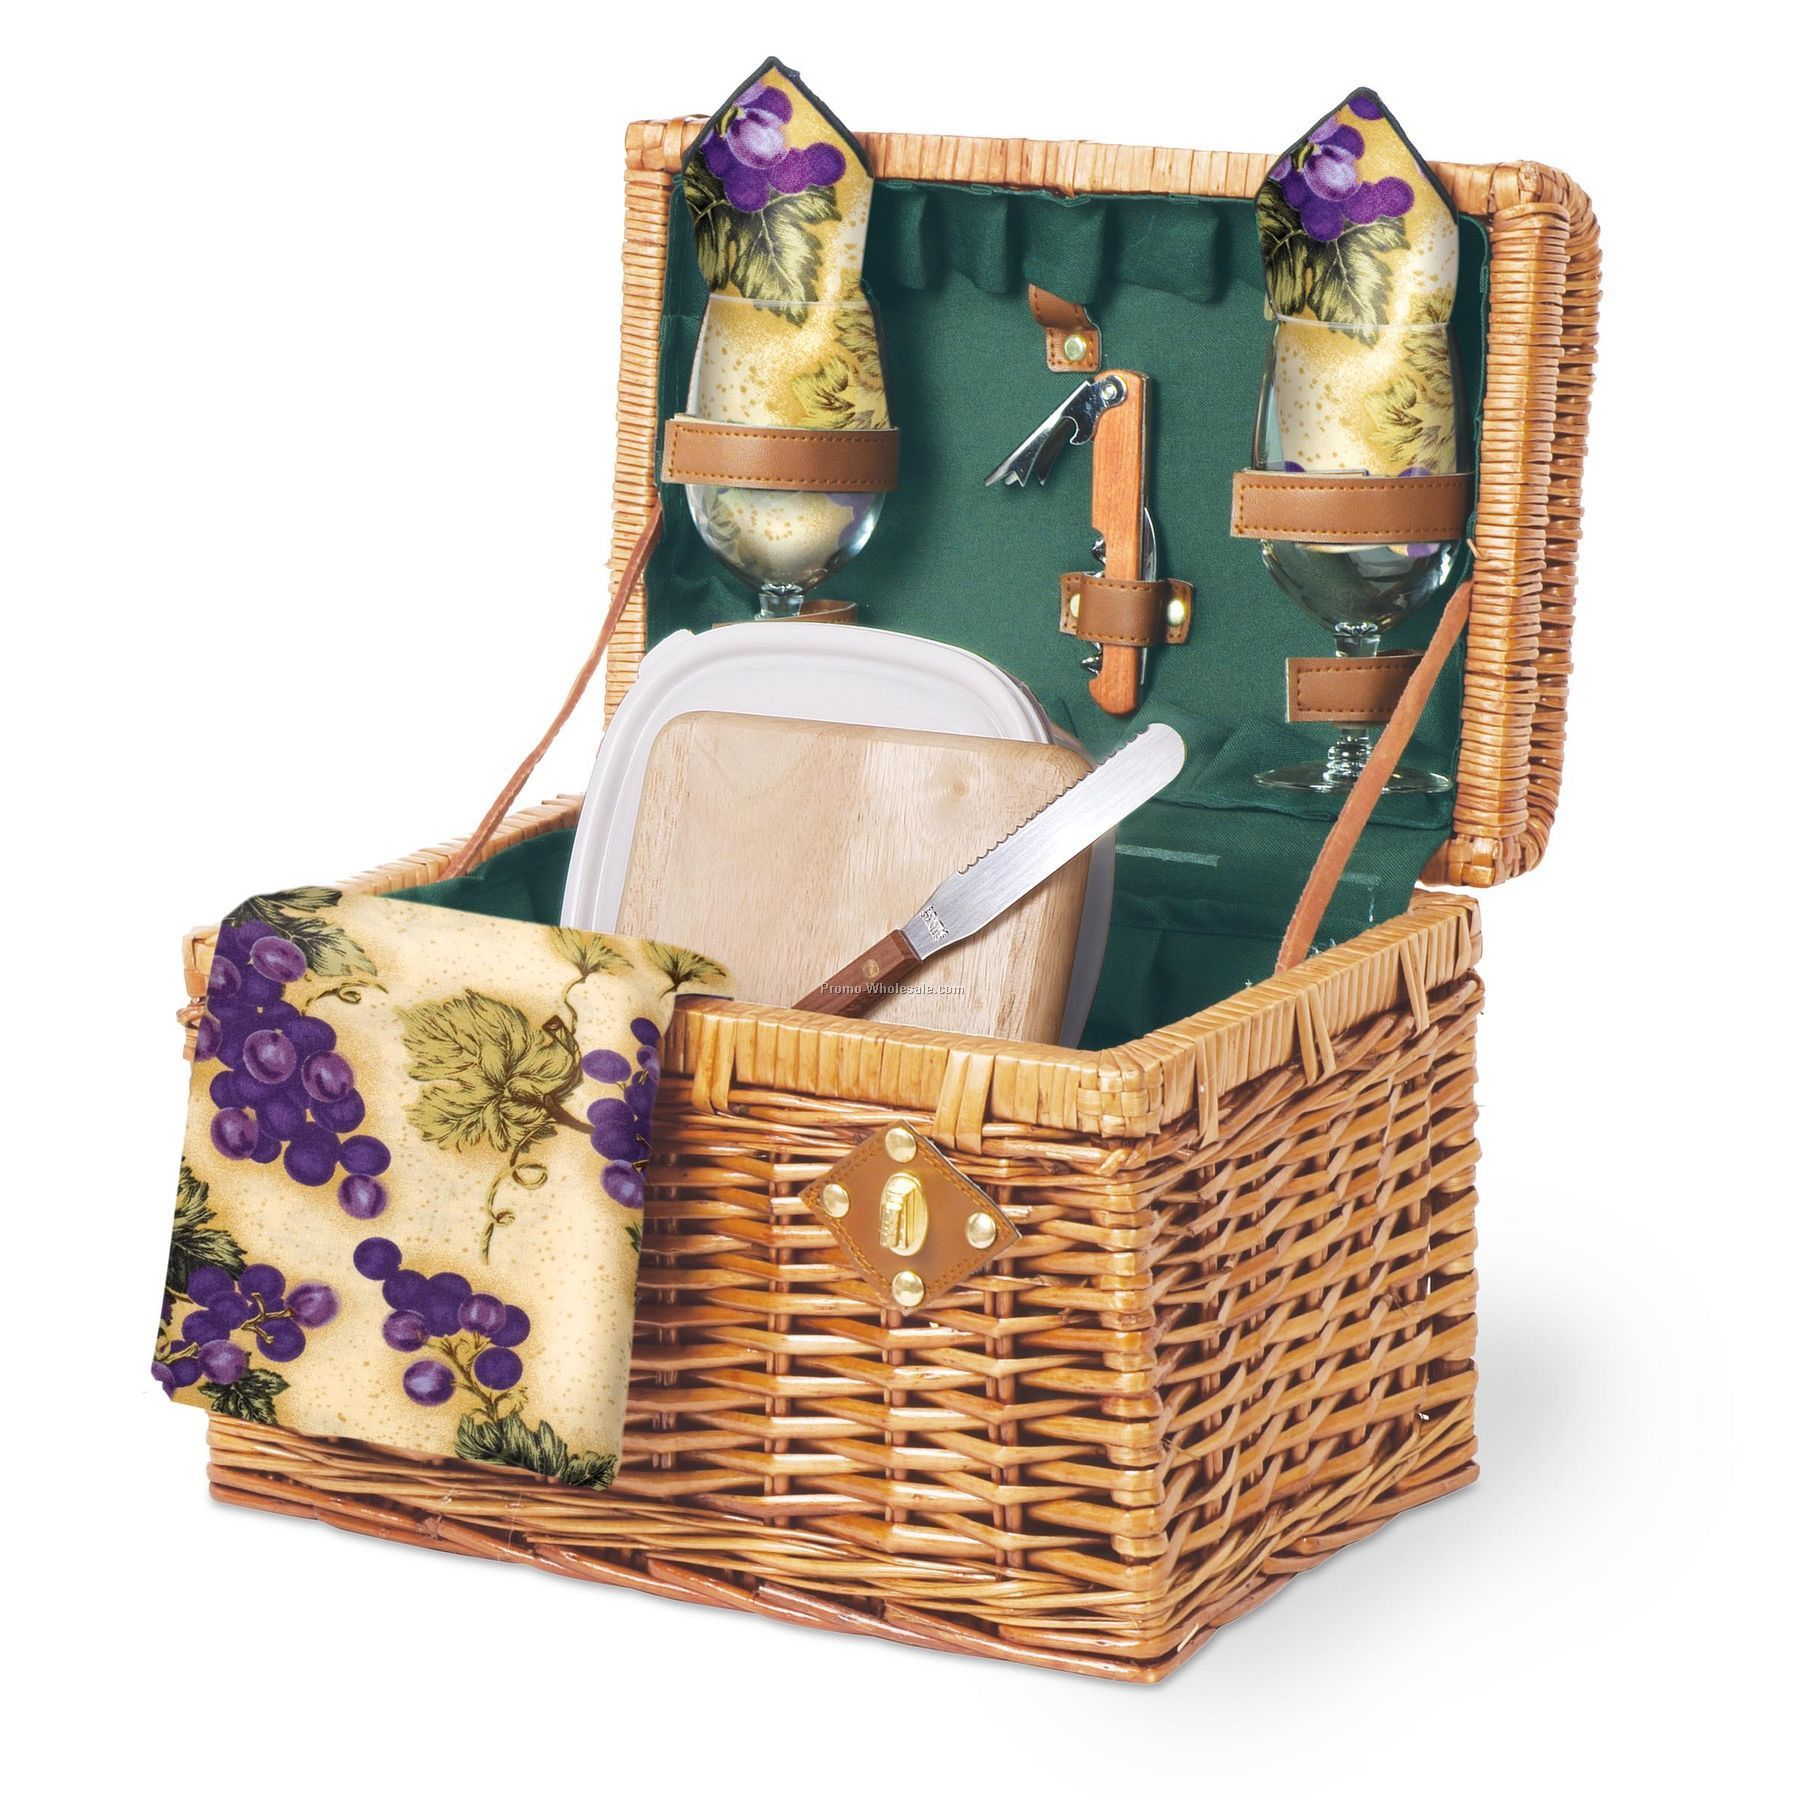 Windsor Picnic Basket For 4 : Windsor english style suitcase picnic basket with service